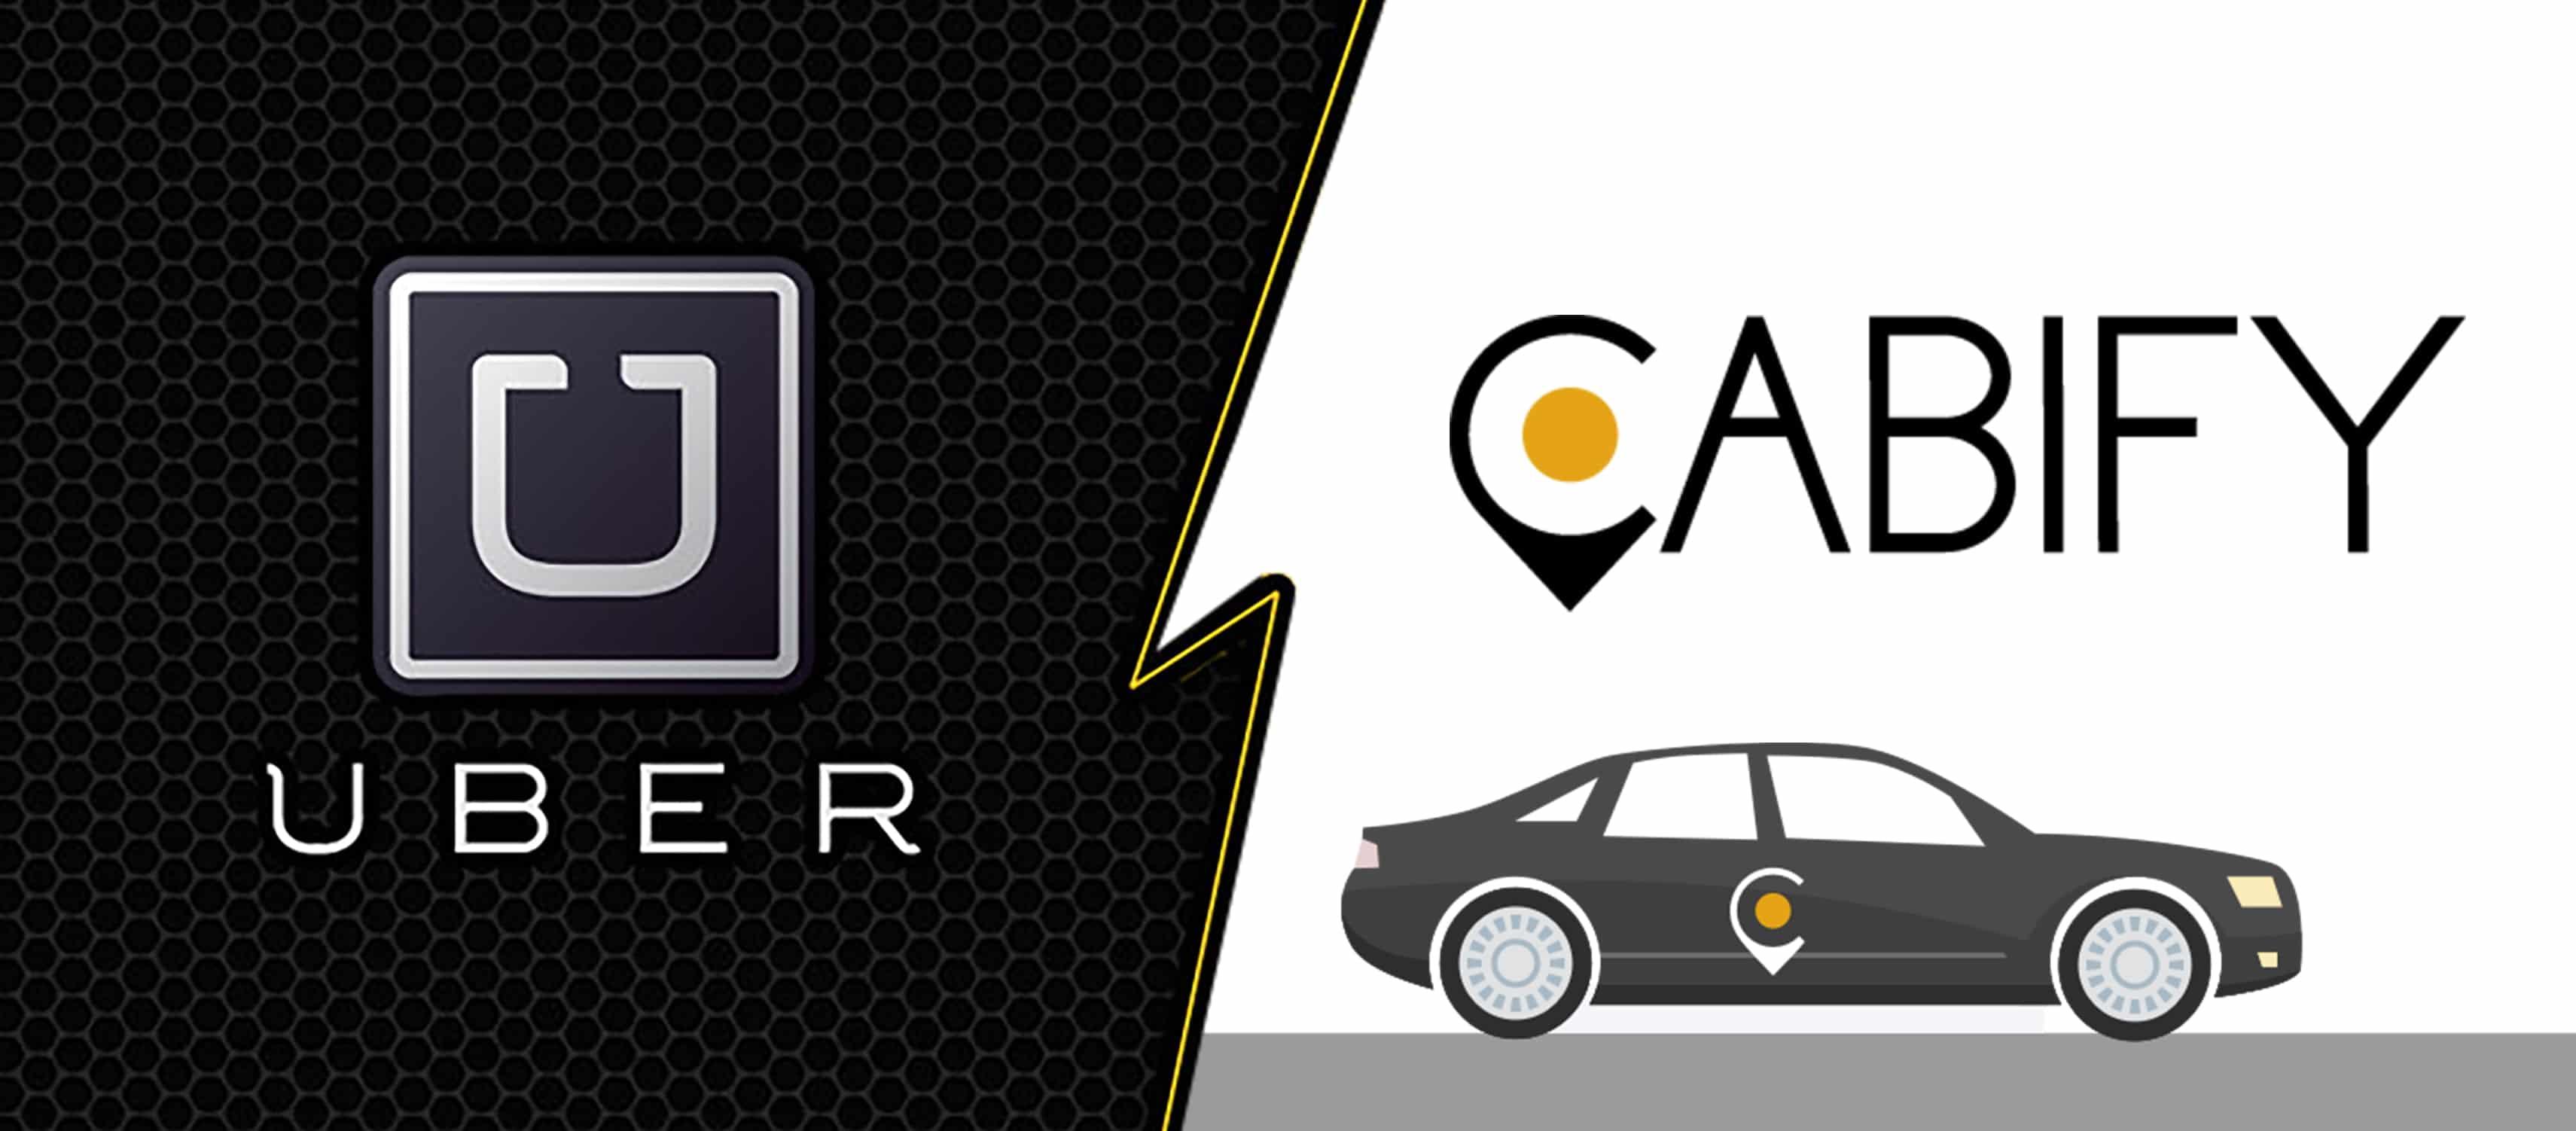 uber cabify